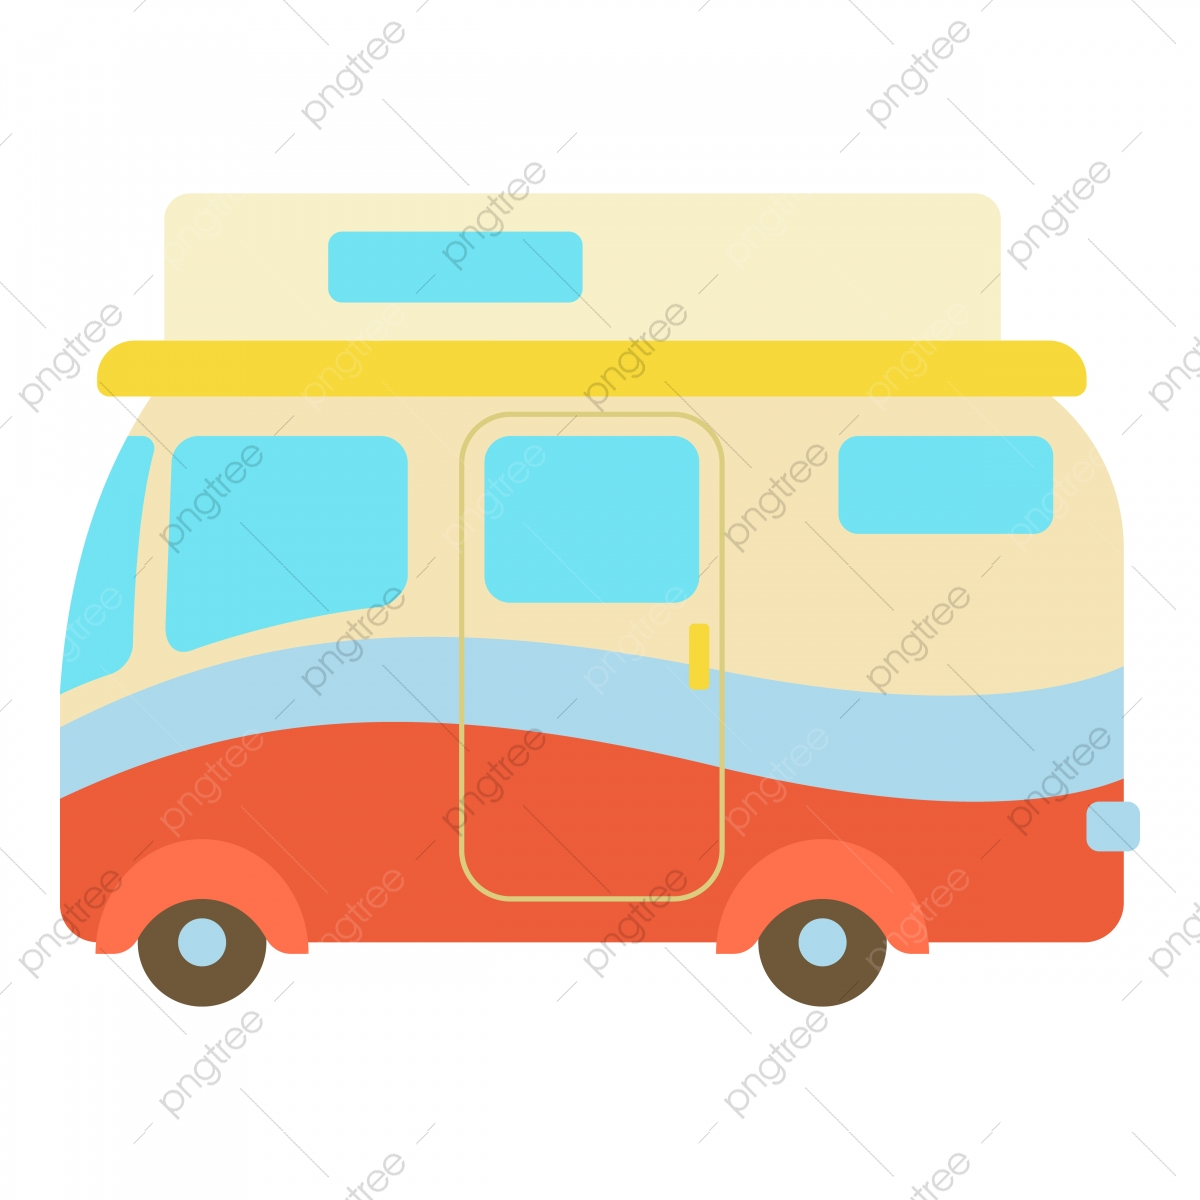 hippie_van_coloring_page_0071-1006-2115-1027_SMU.jpg 300×222 pixels    Hippie bus, Coloring pages, Flower coloring pages